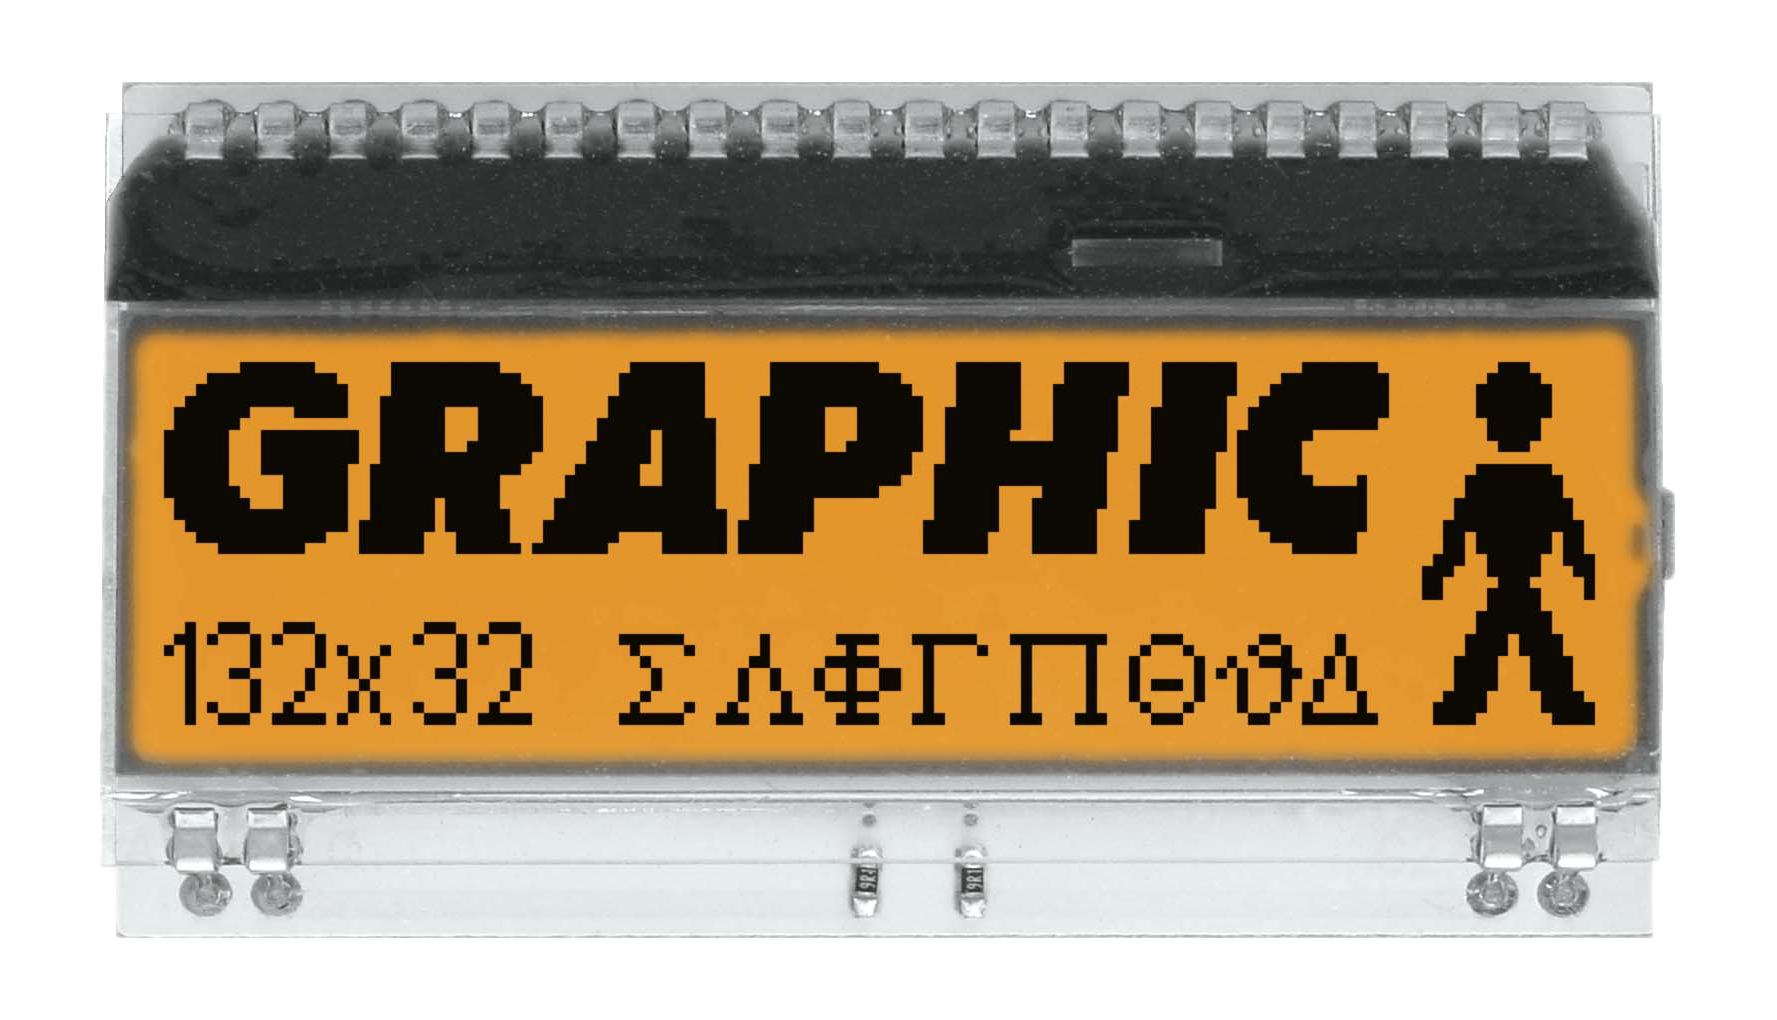 132x32 DOG Graphic Display